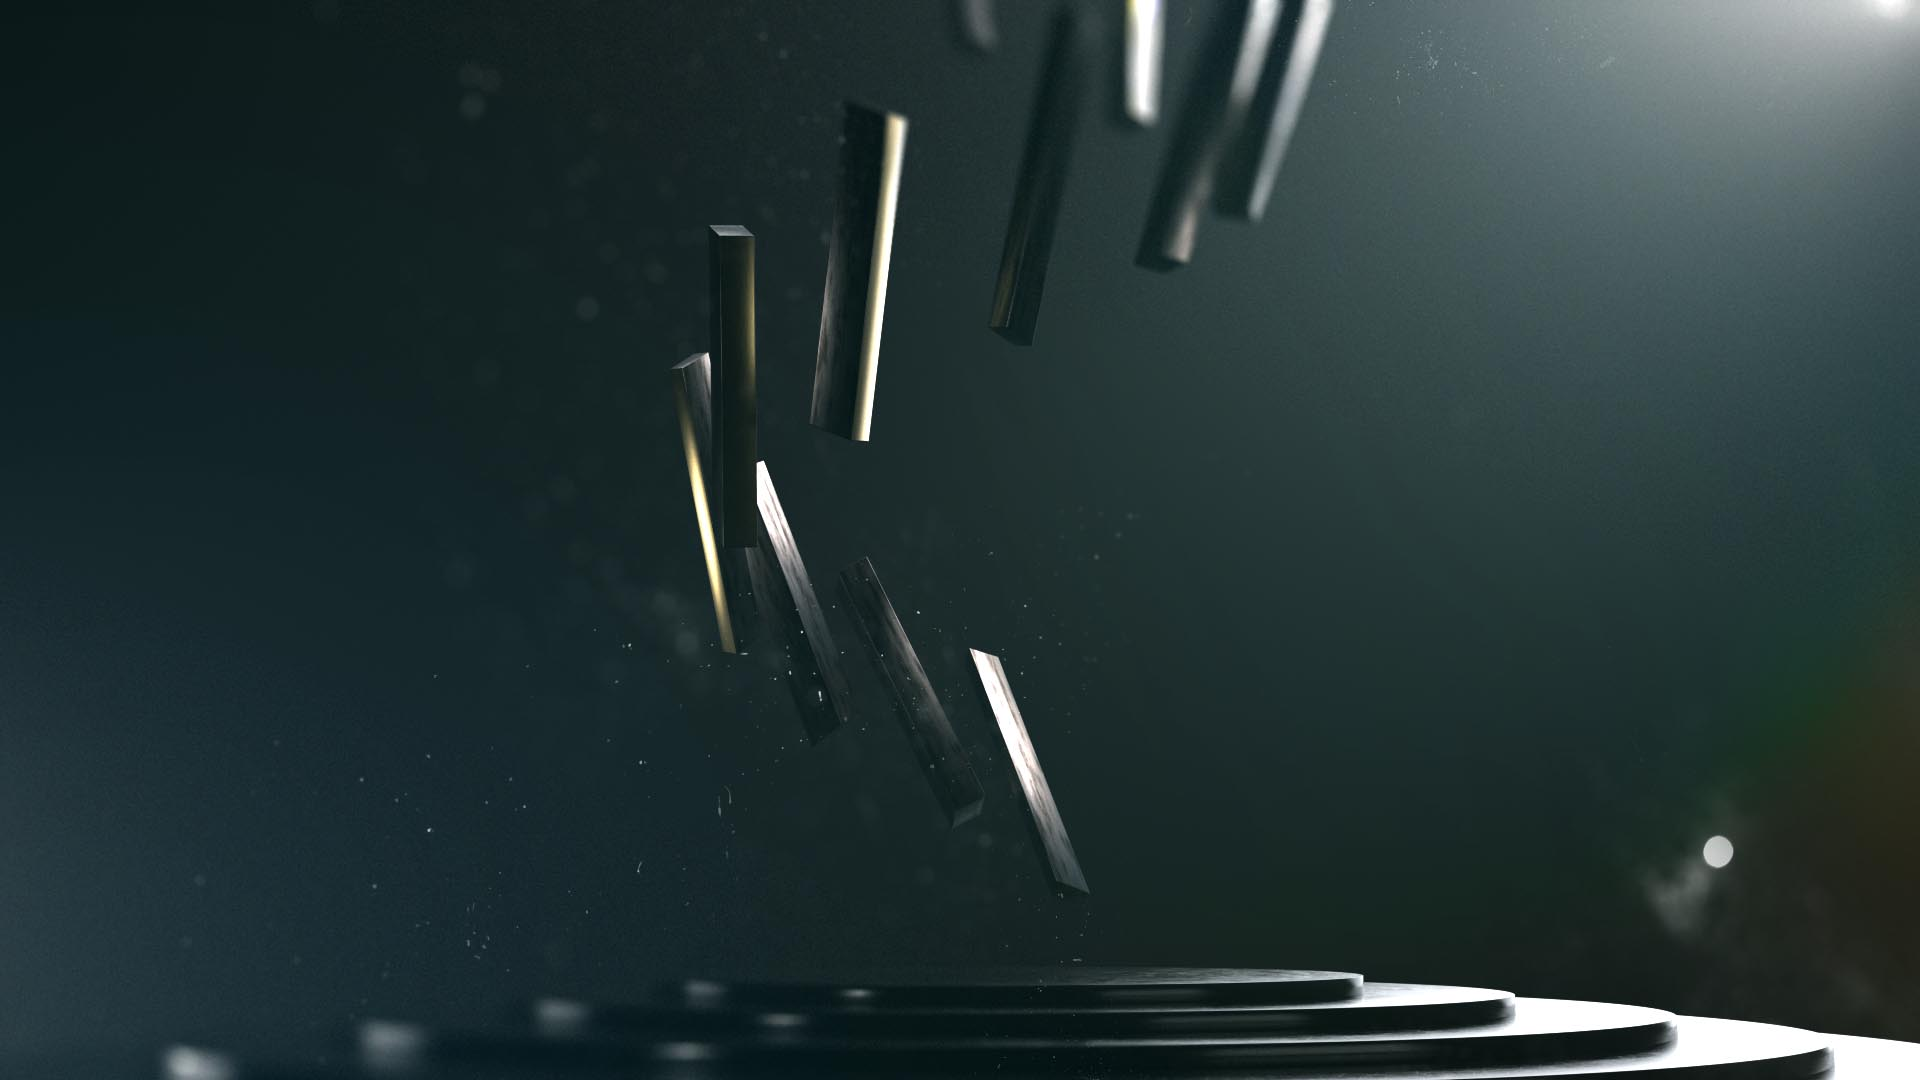 3D Trailer Immowelt Titelbild